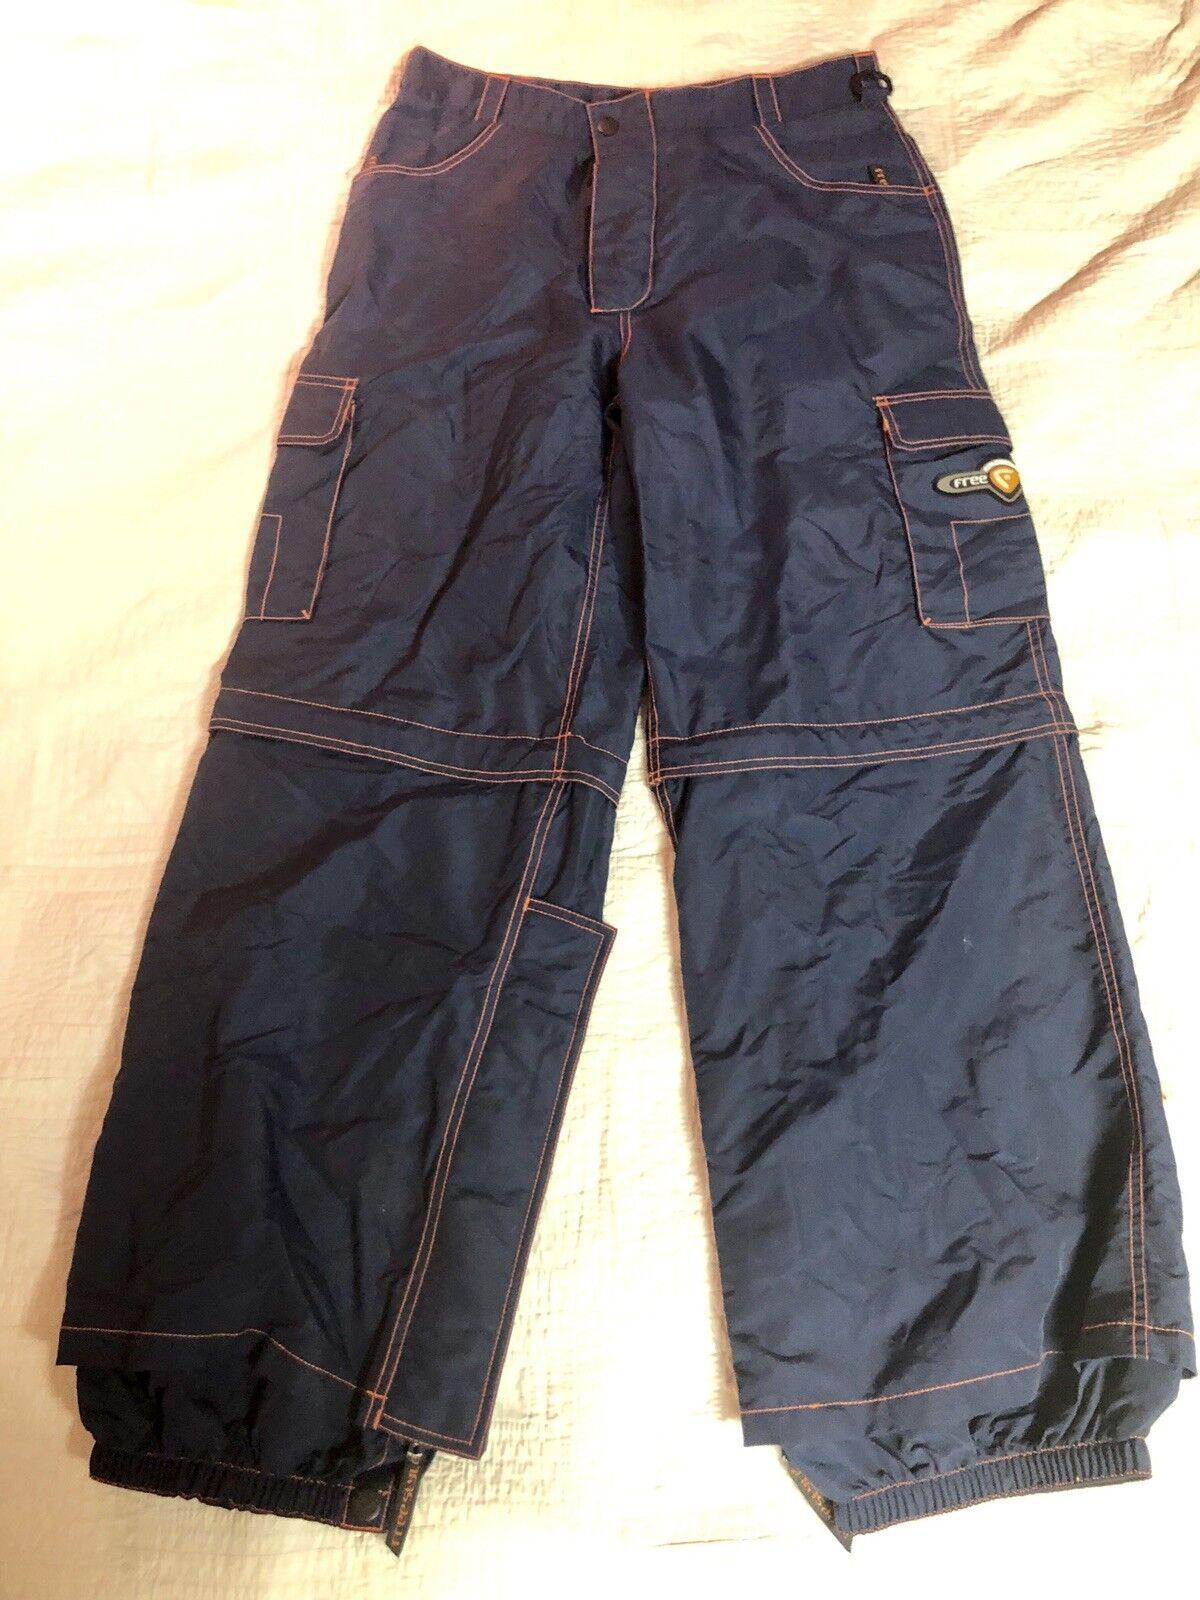 Coldwave Freestyle Snow Pants Size 36 blueee orange Trim